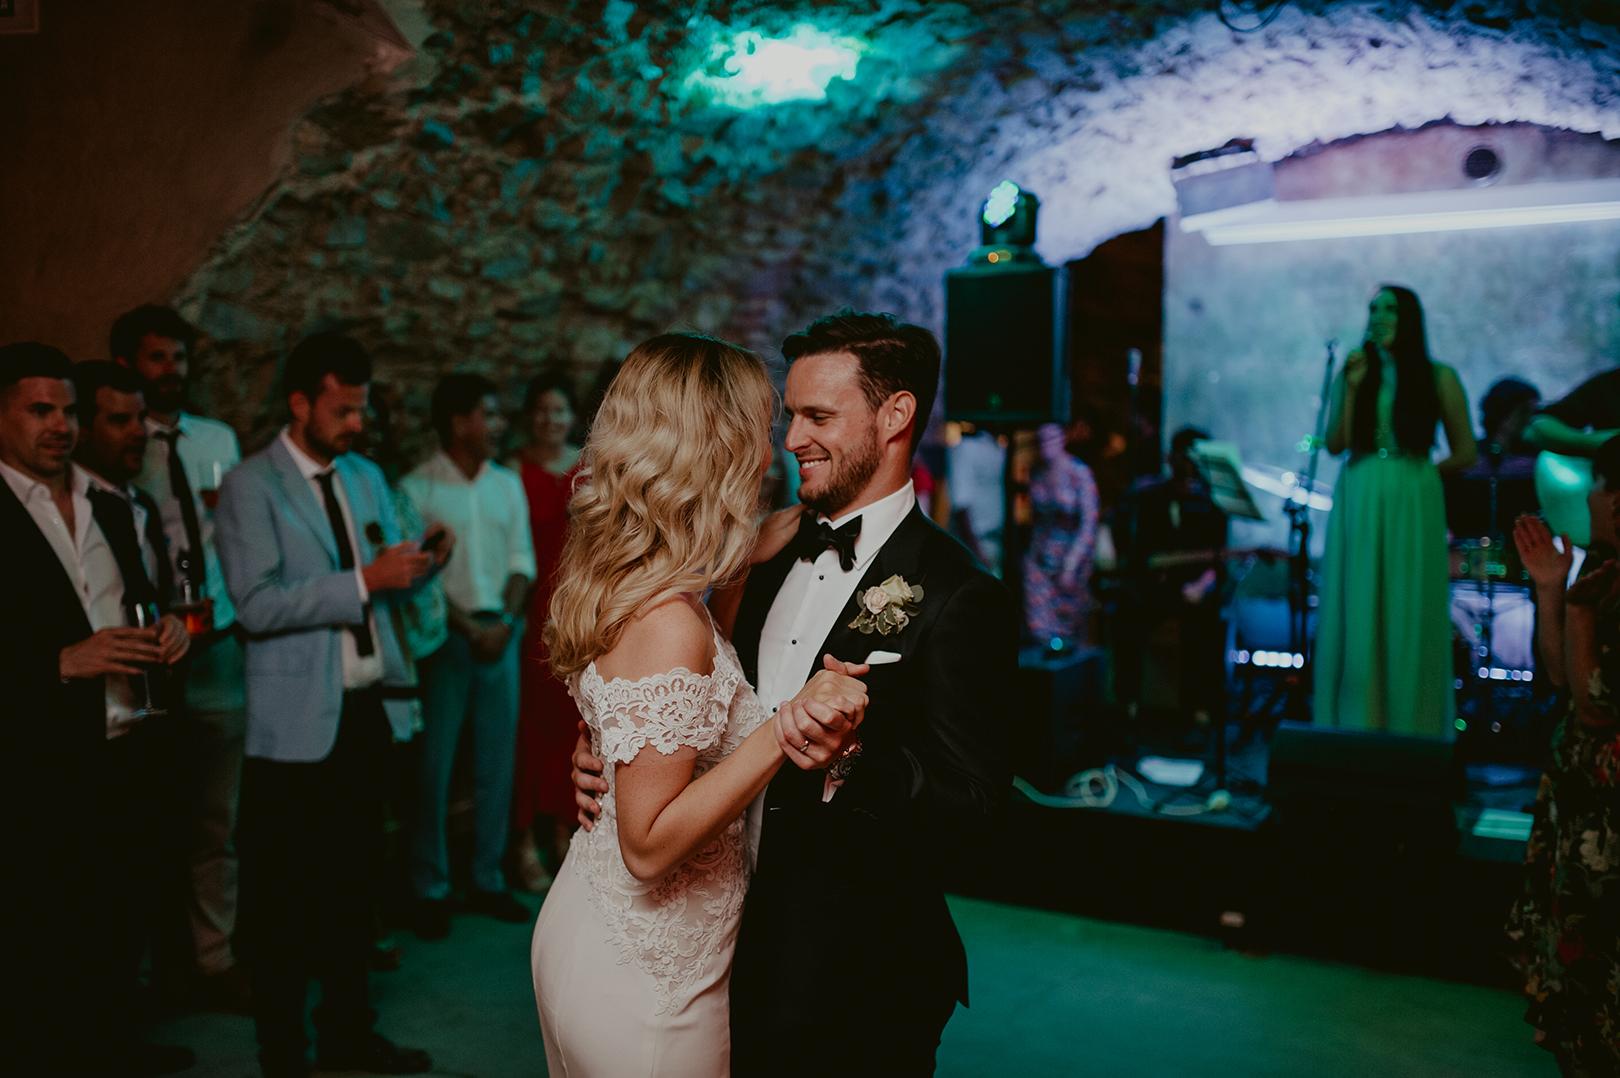 Wedding celebration at Castell d'Emporda in Girona